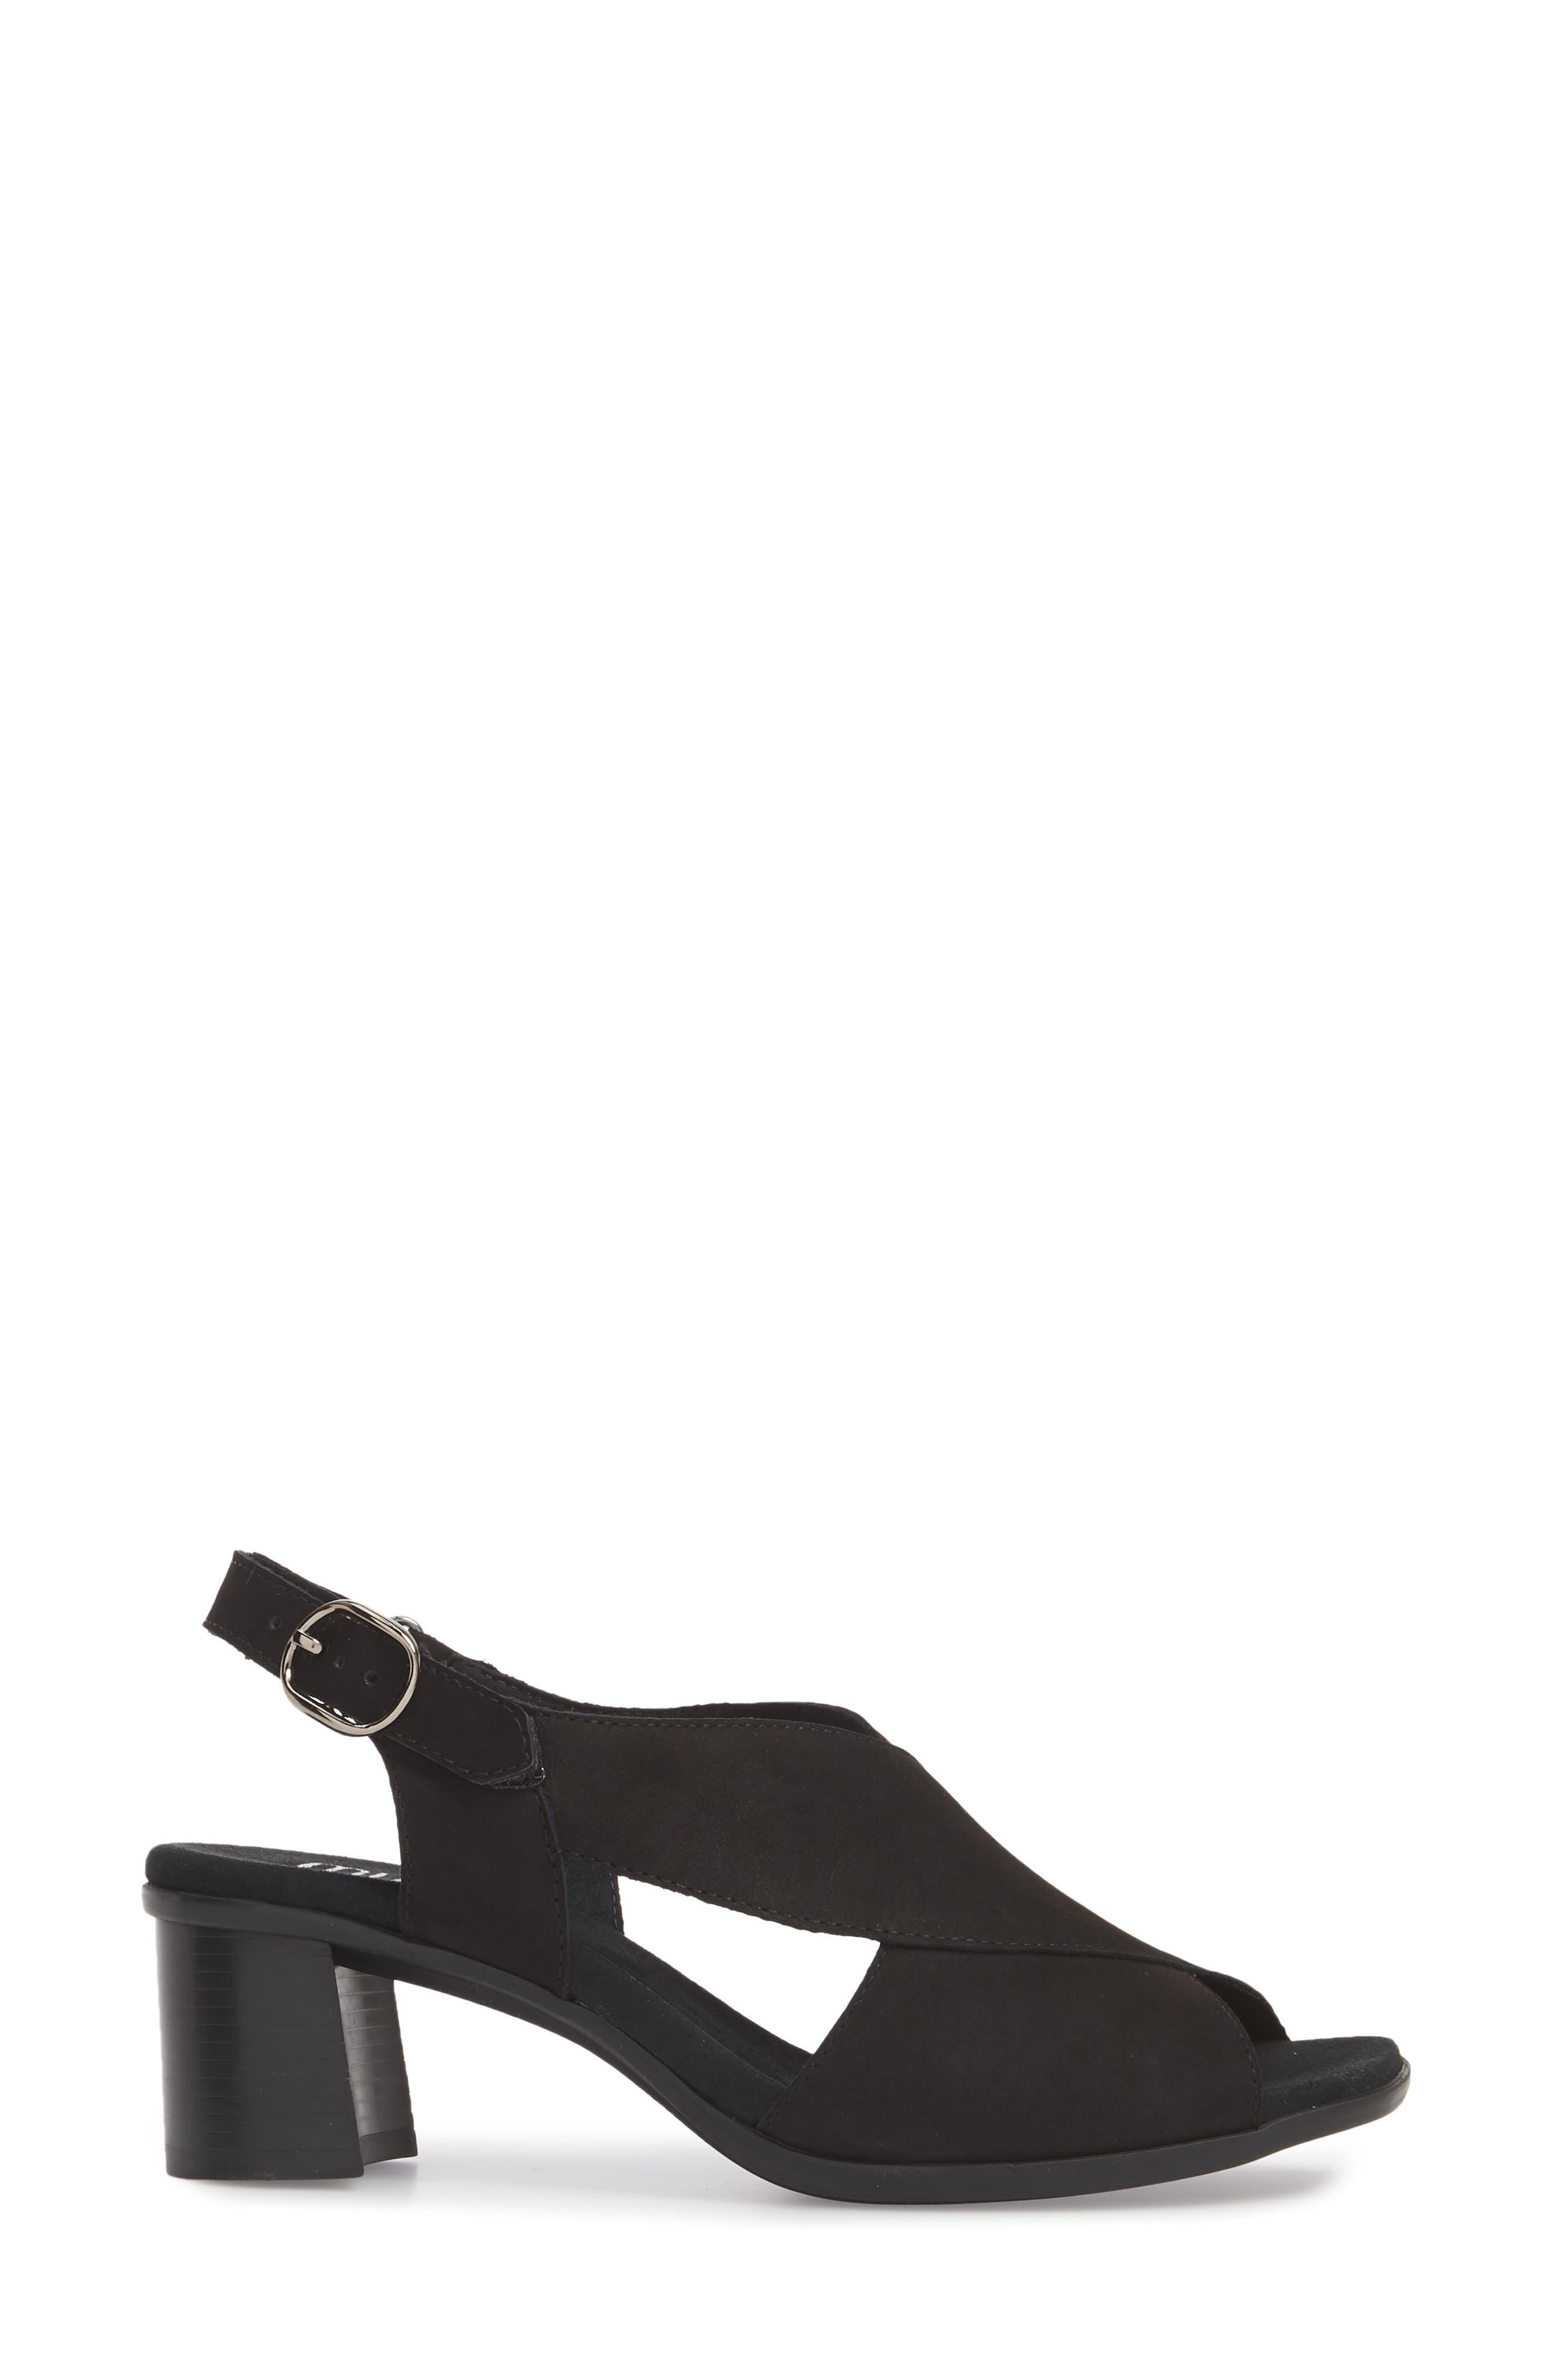 Laine Block Heel Sandal,                             Alternate thumbnail 3, color,                             BLACK NUBUCK LEATHER